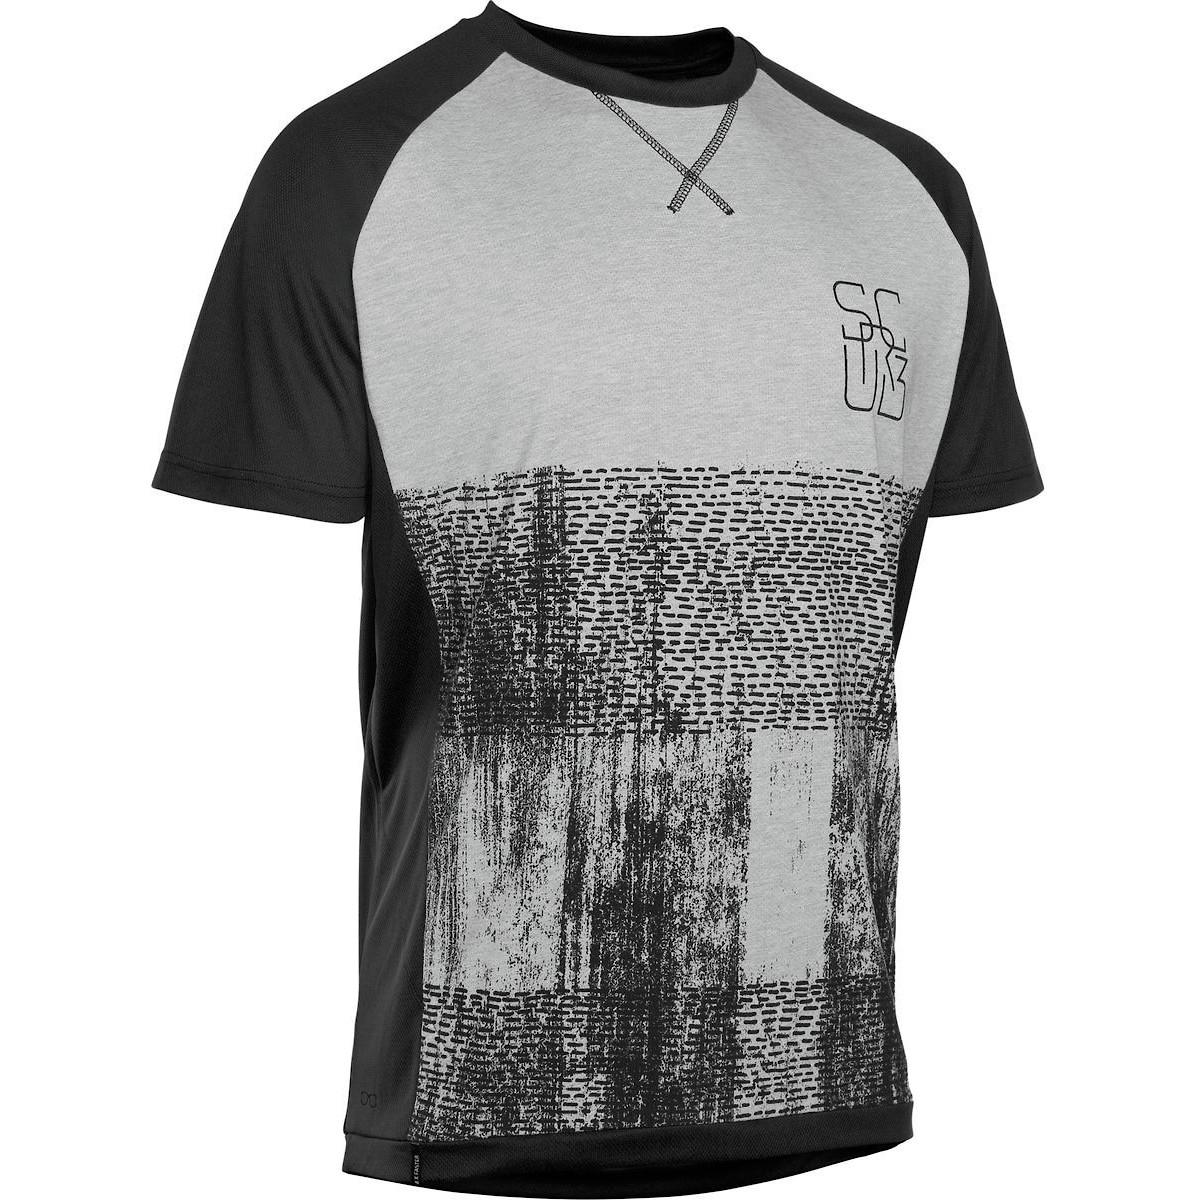 ION Scrub Amp Short-Sleeve Jersey (black)